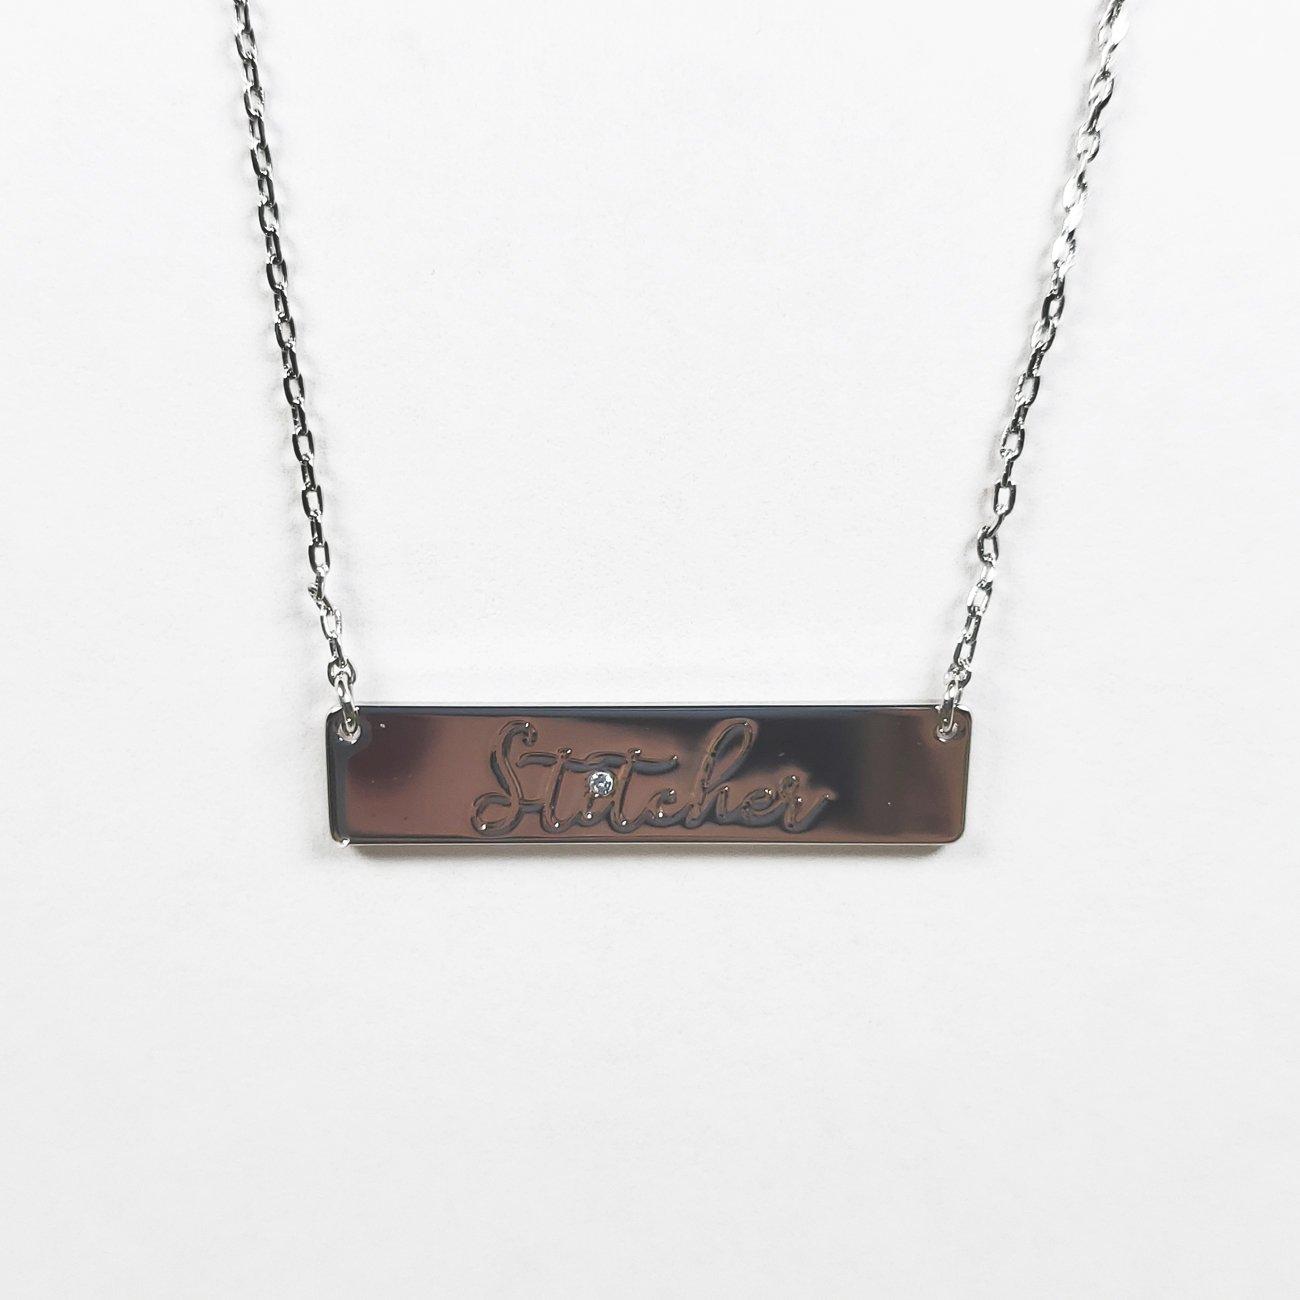 Stitcher Bar Necklace Silver